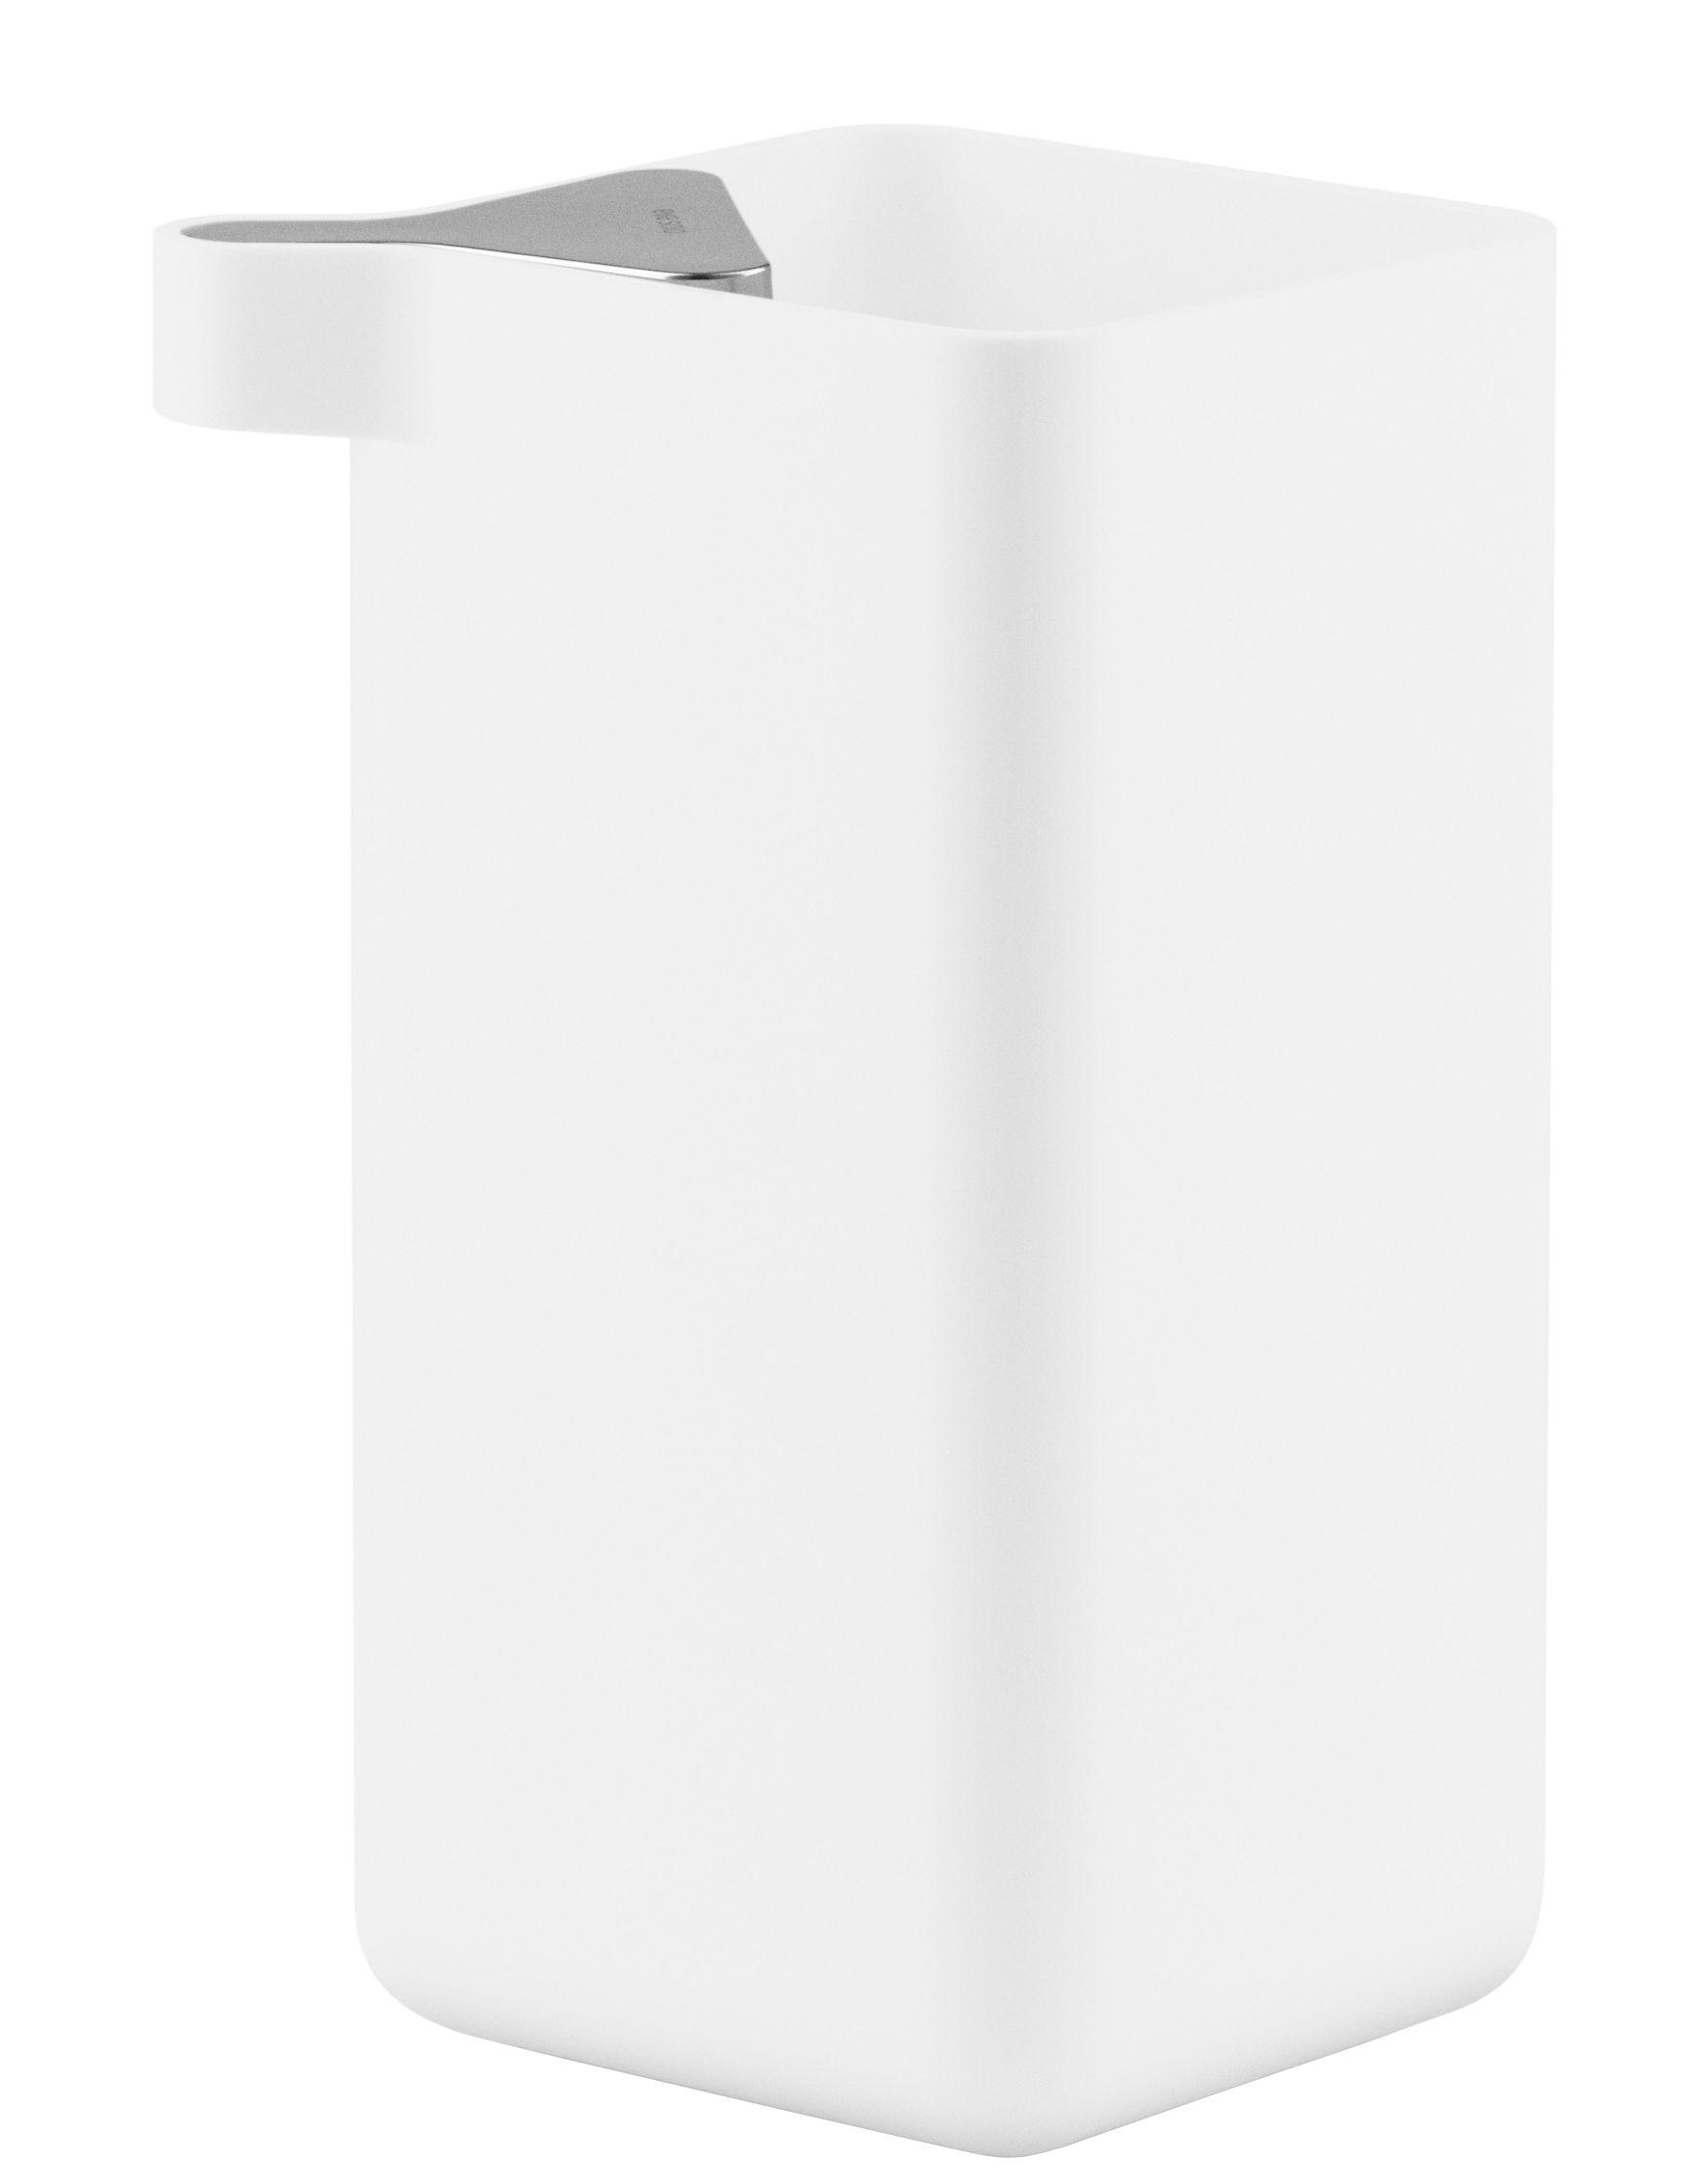 soap  n tidy soap dispenser white by eva solo